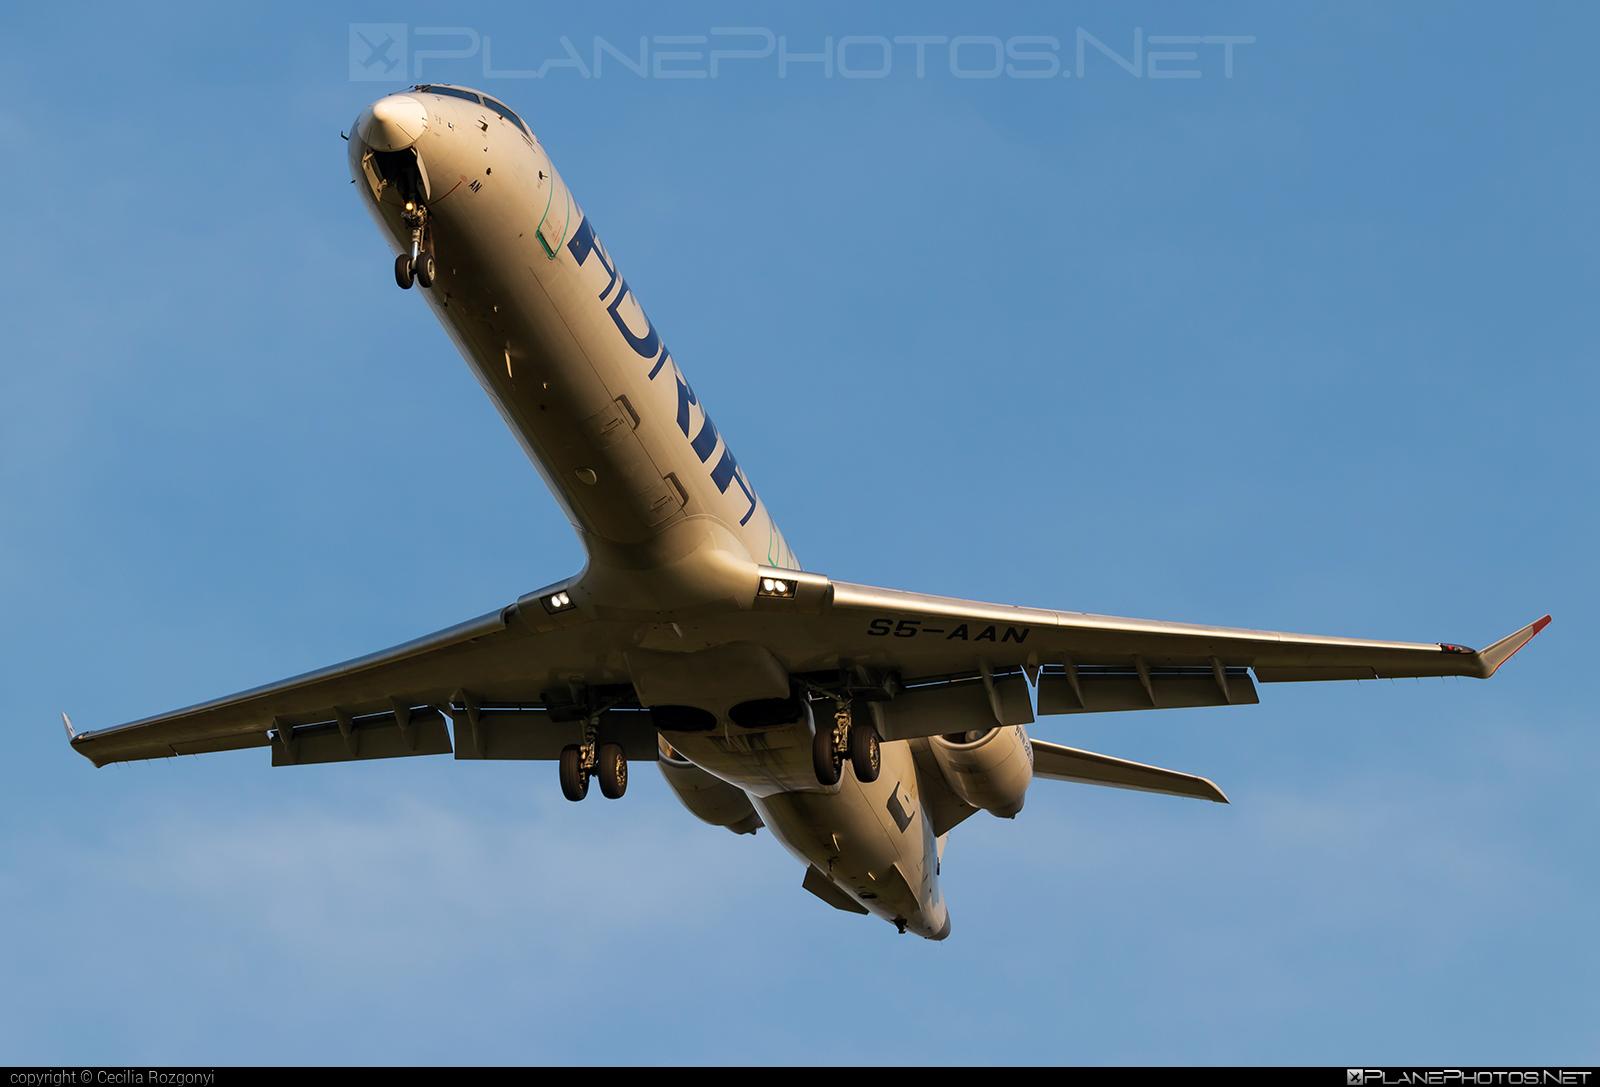 Bombardier CRJ900 NextGen - S5-AAN operated by Adria Airways #bombardier #crj900 #crj900nextgen #crj900ng